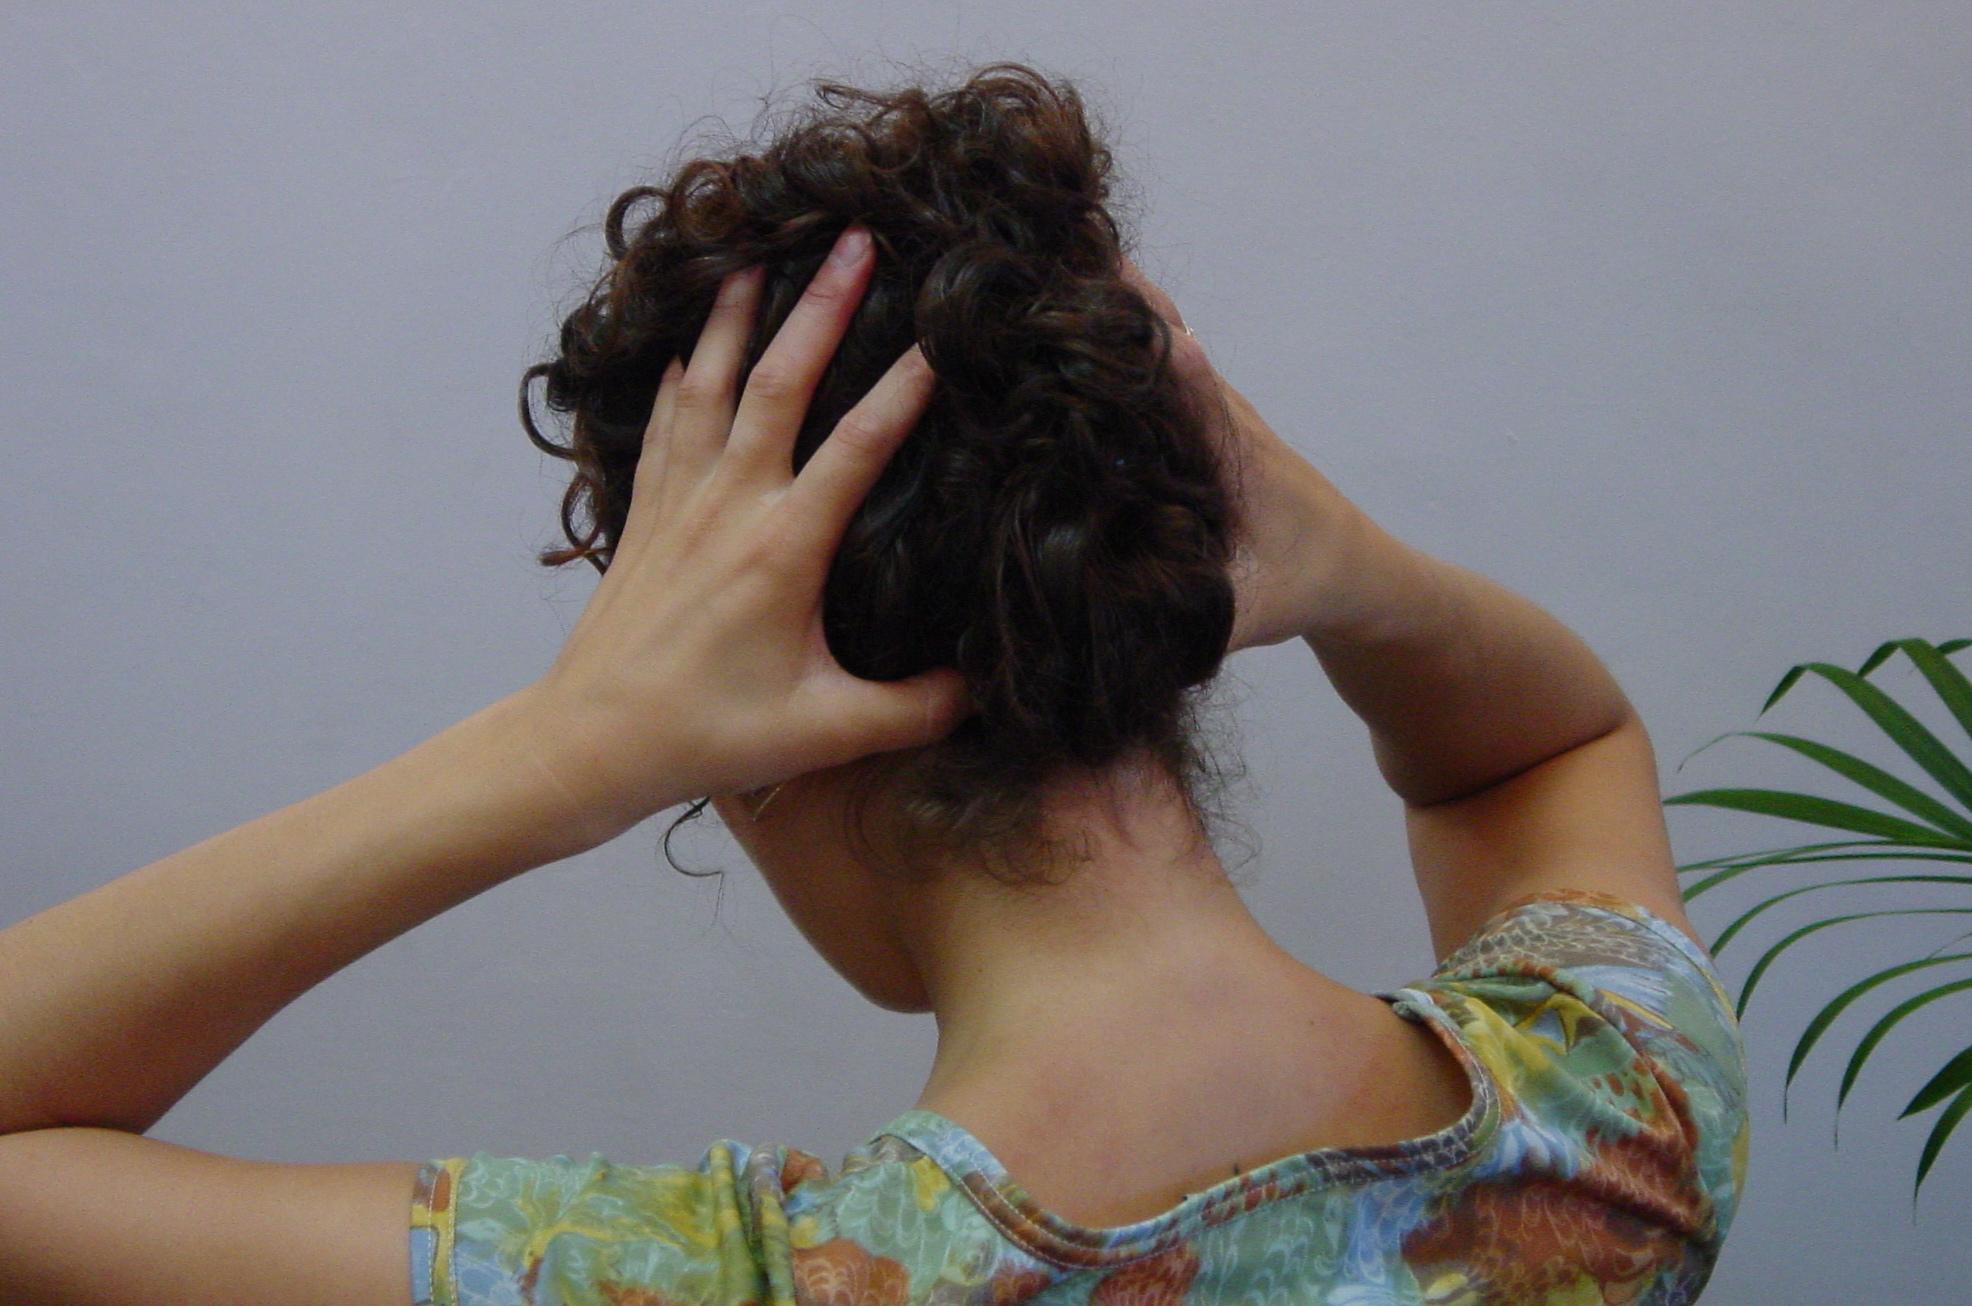 Acupressure Points for Headaches, Stiff Neck & Pain Relief ...